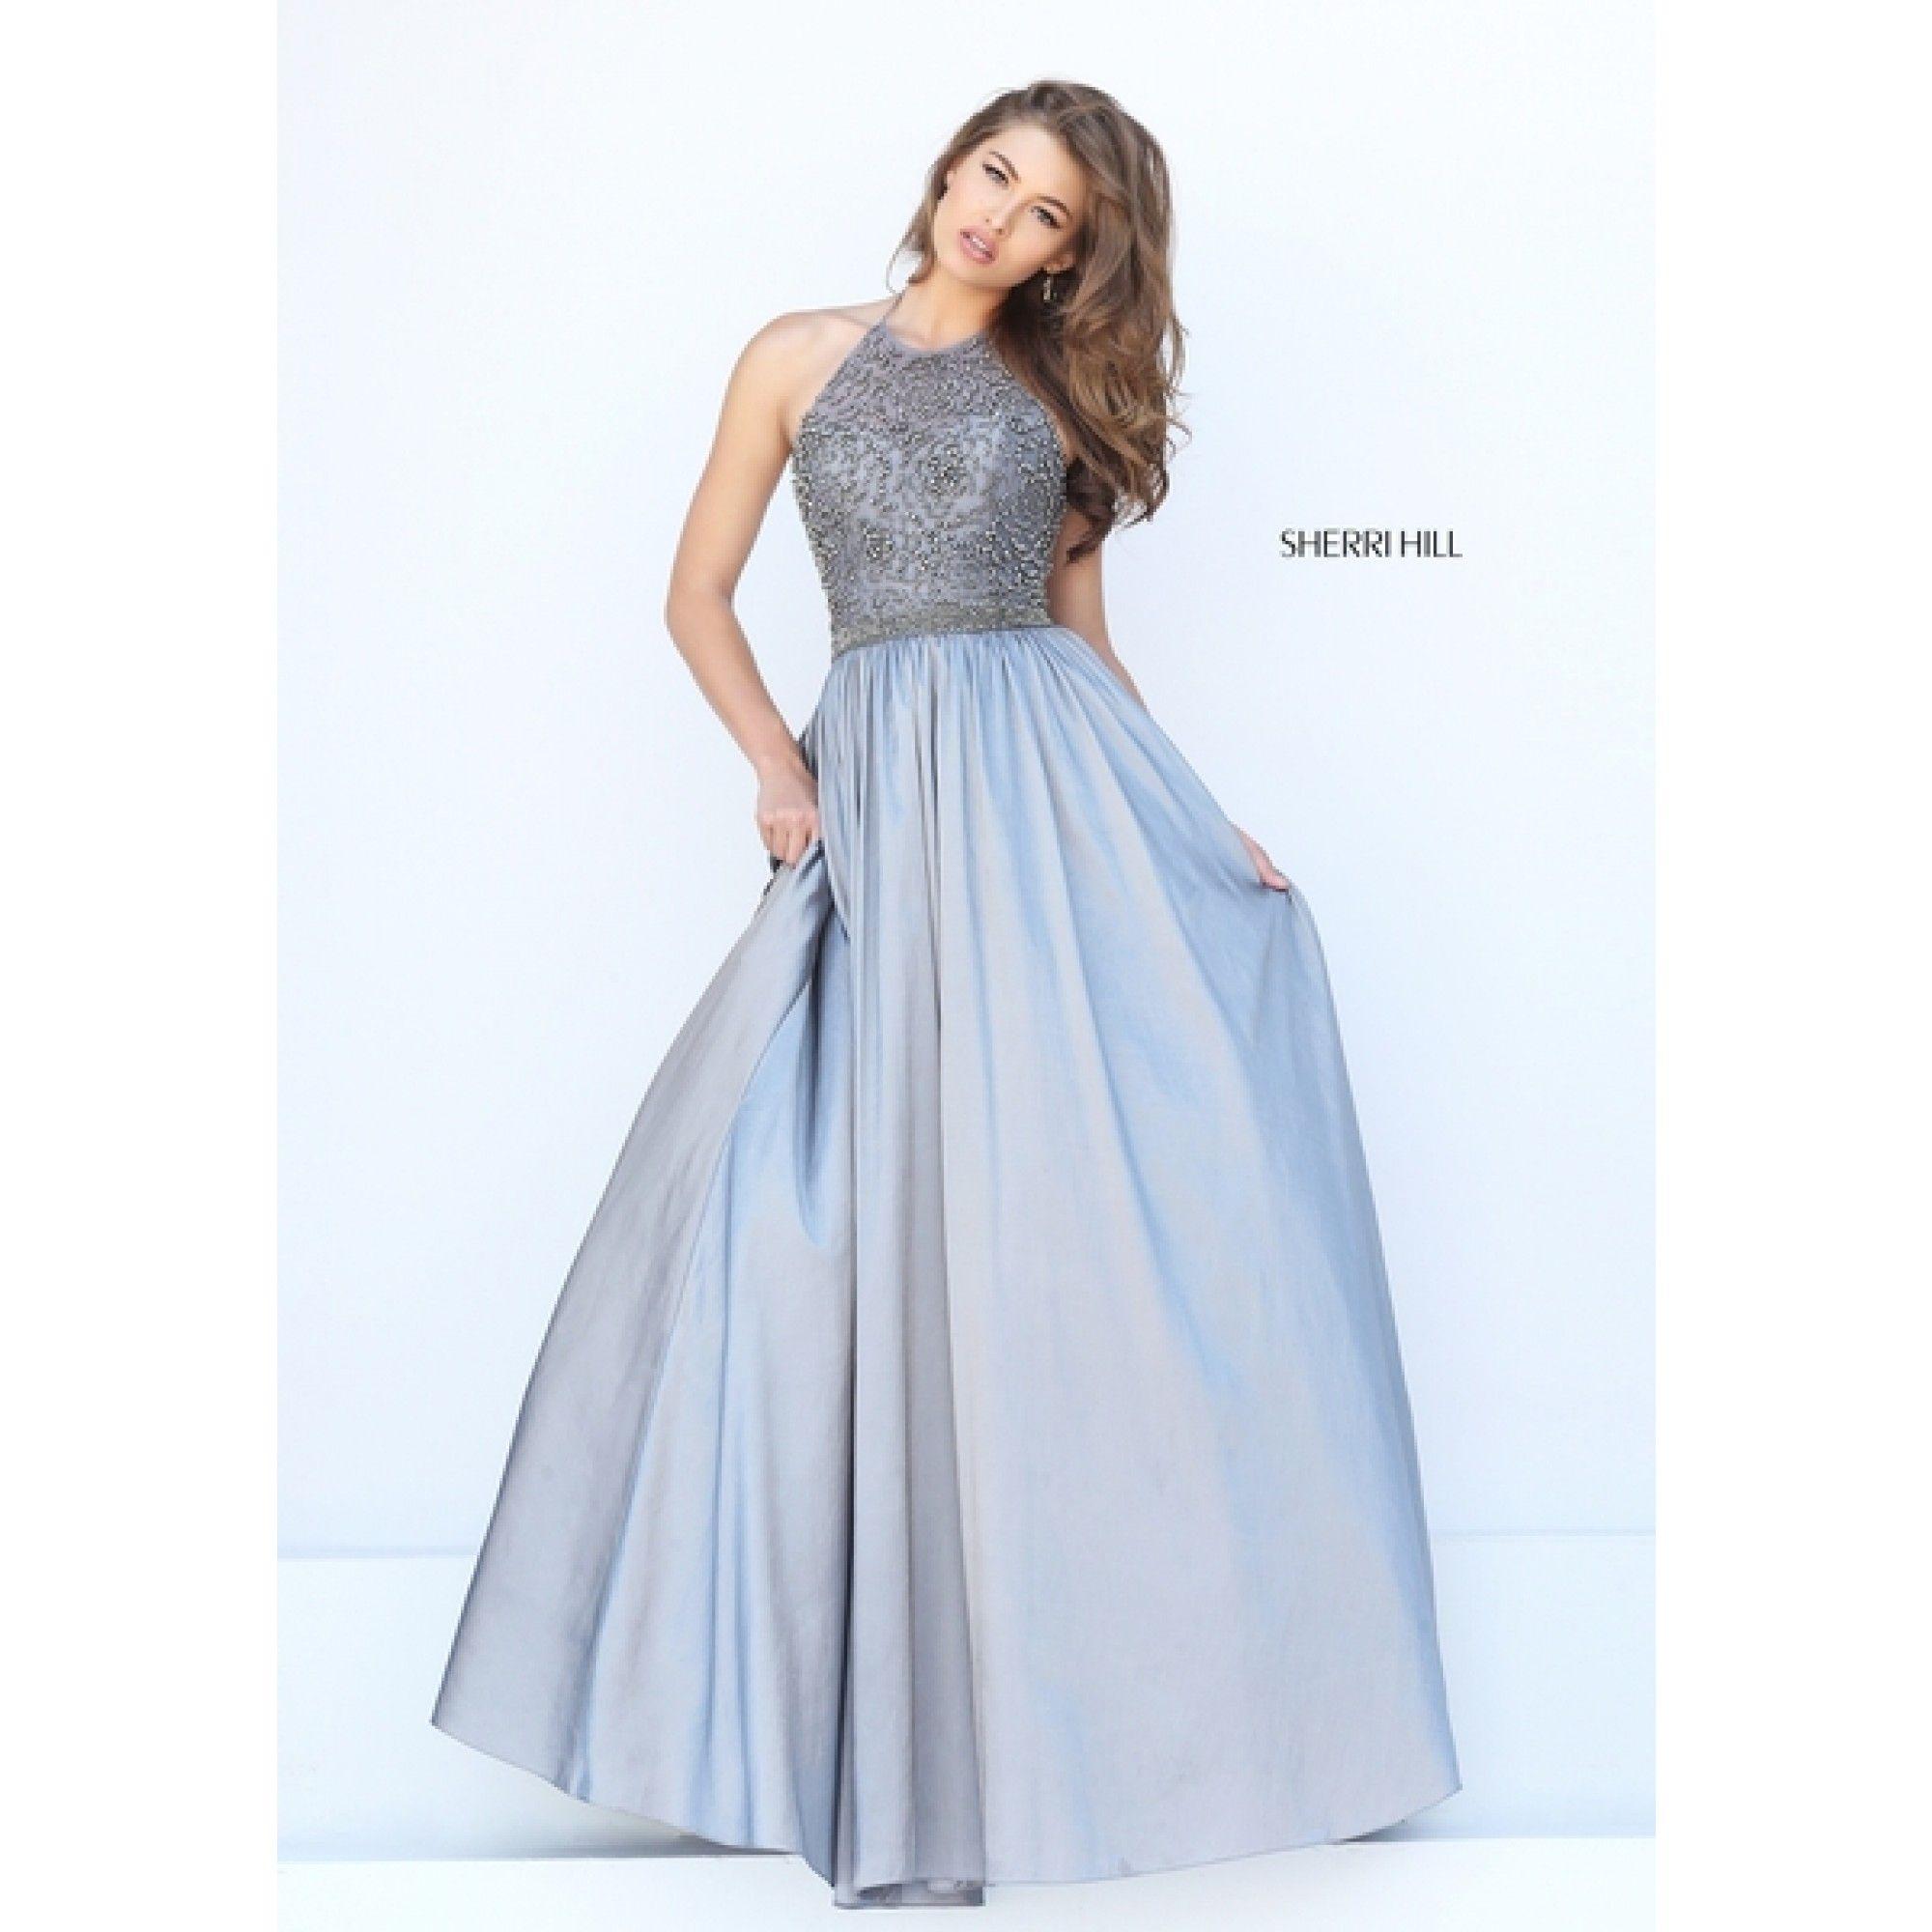 Sherri hill sherri hill prom dress tampabridalshops